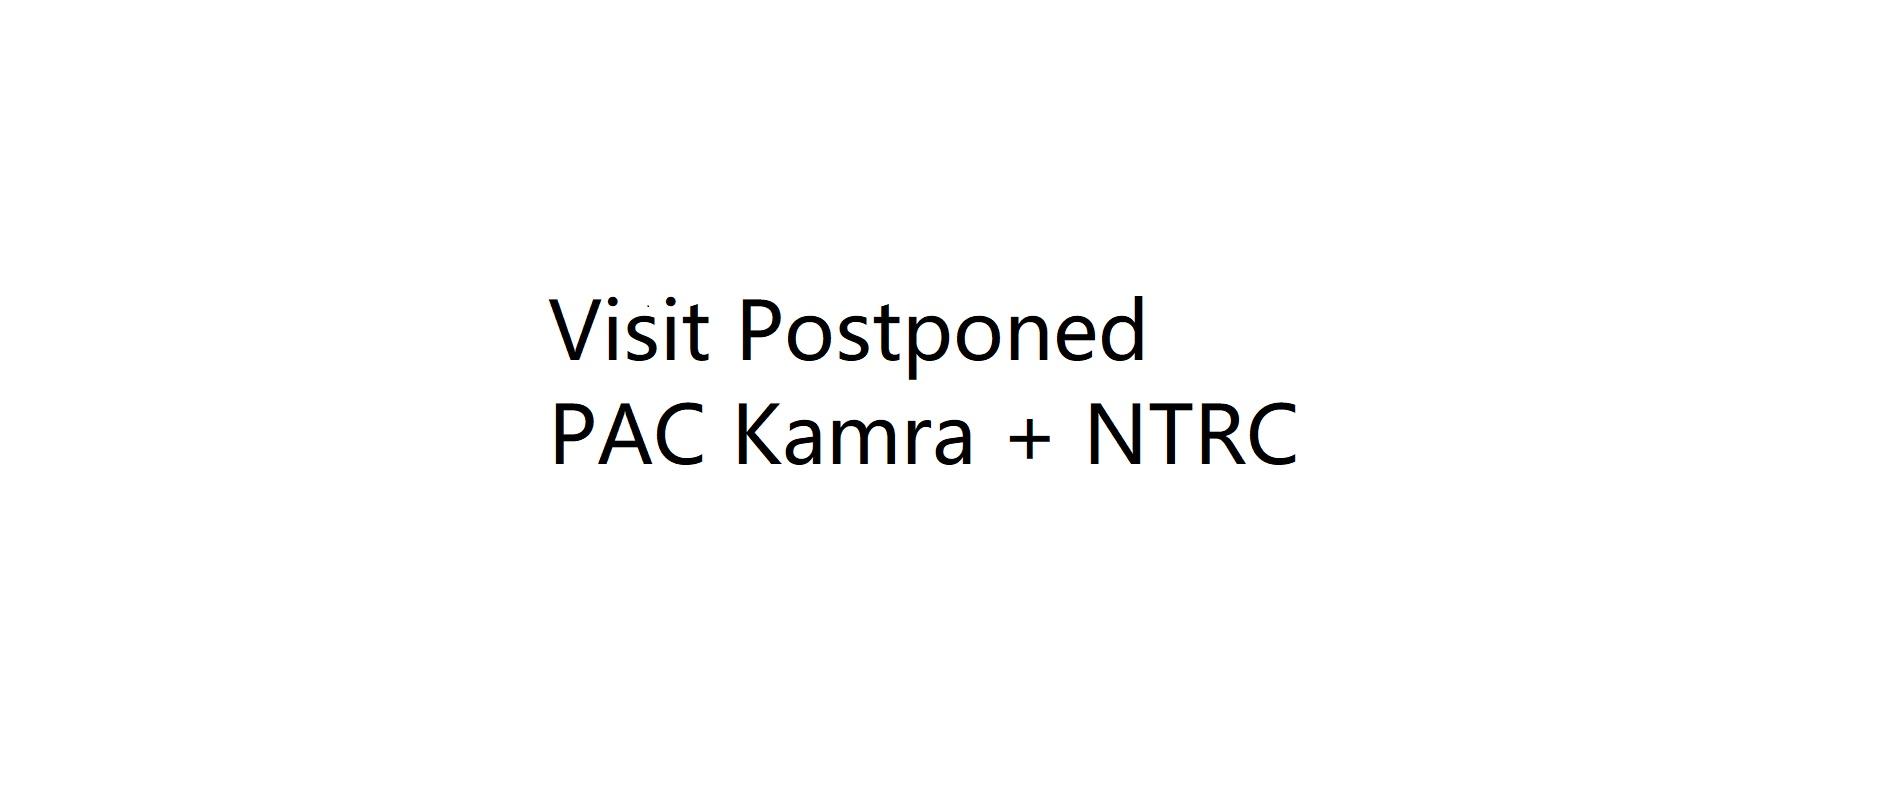 Visit Postponed (PAC Kamra + NRTC)